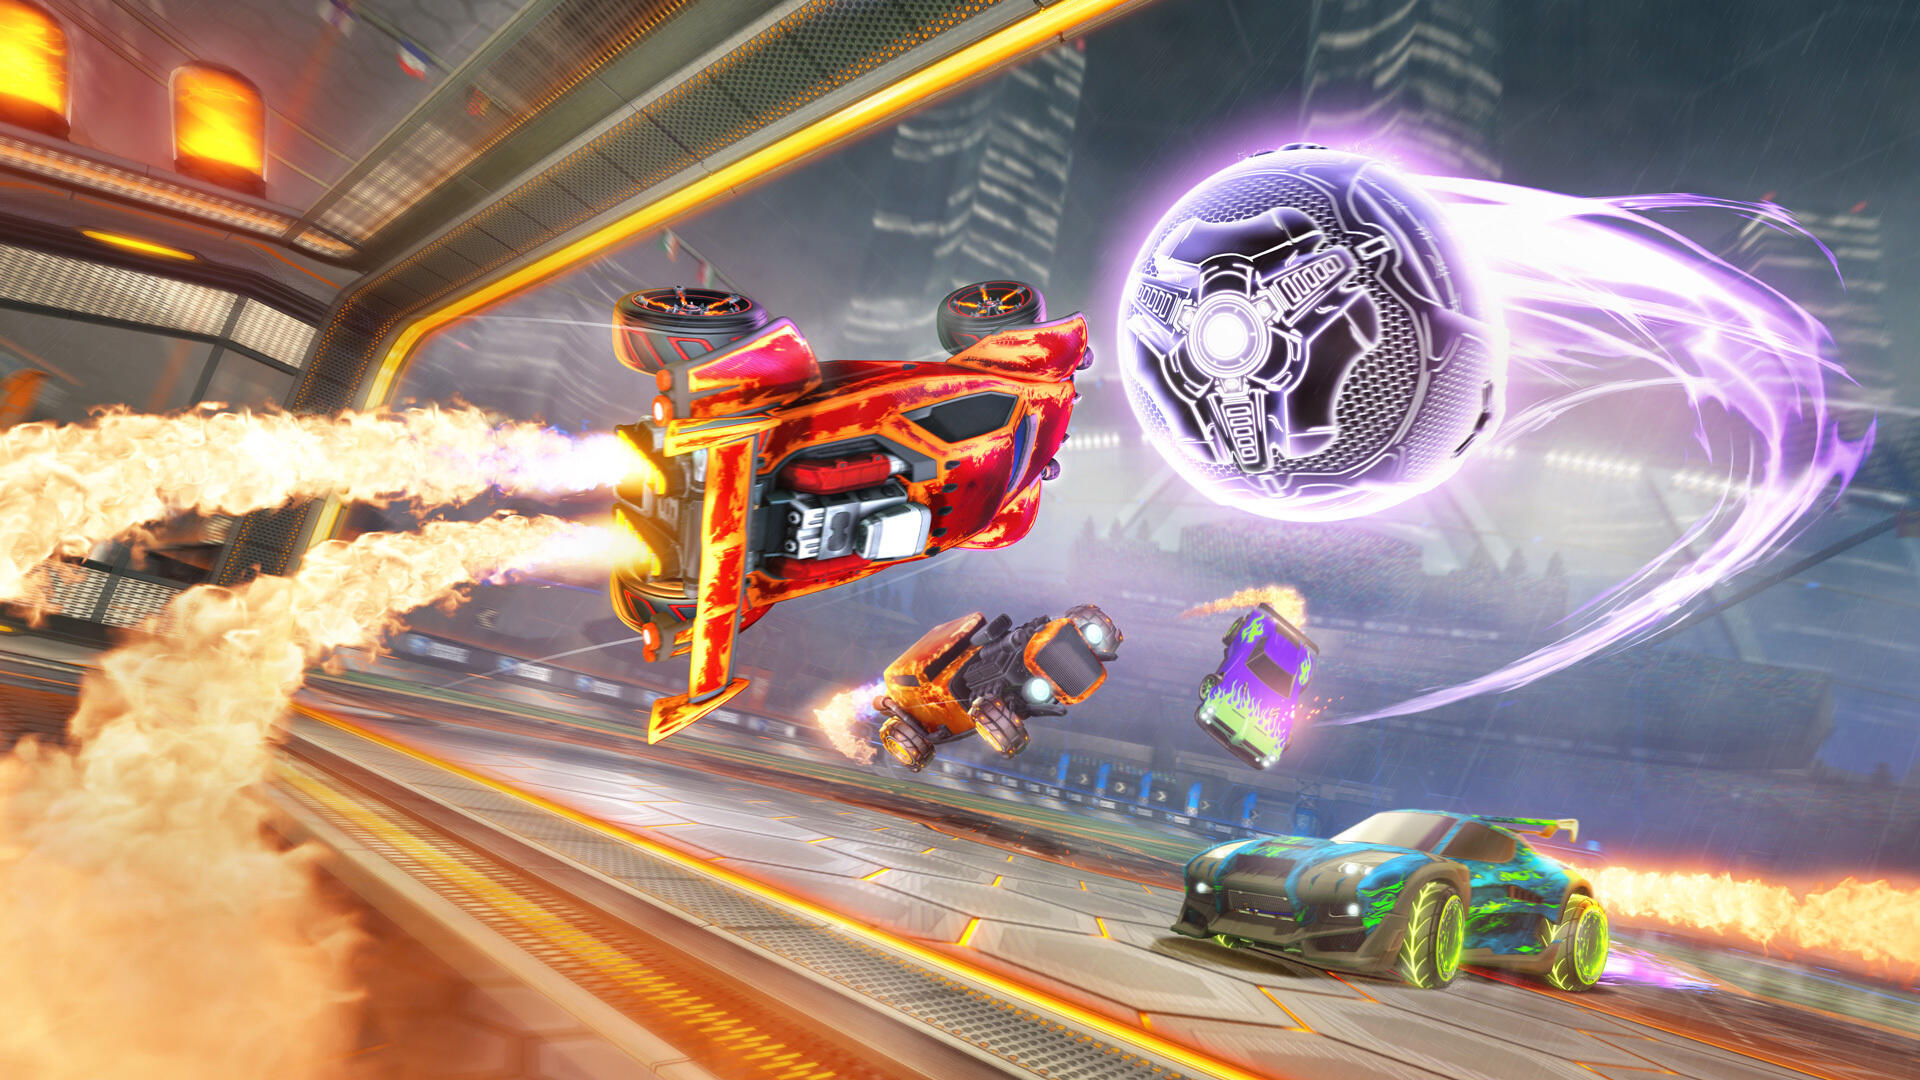 Rocket League's new limited-time mode turns the ball into a heatseeking missile screenshot